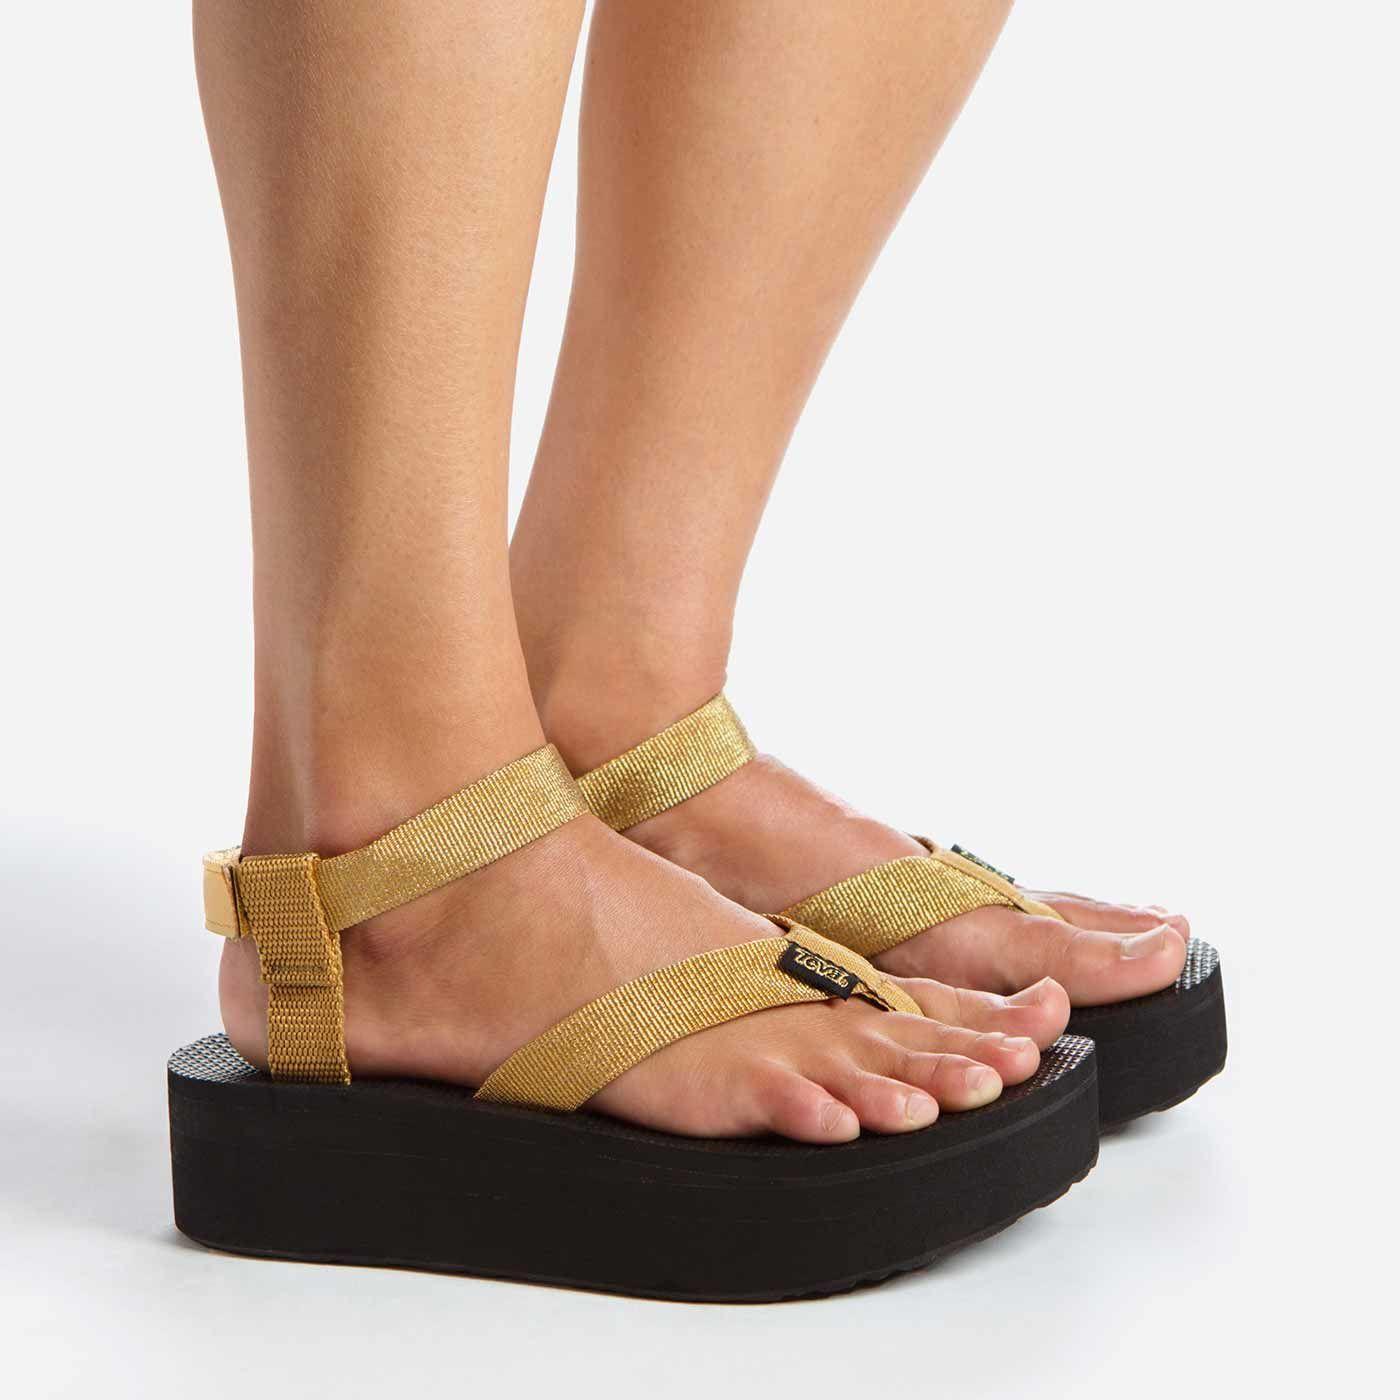 Teva® Women's Flatform Sandal | Teva.com